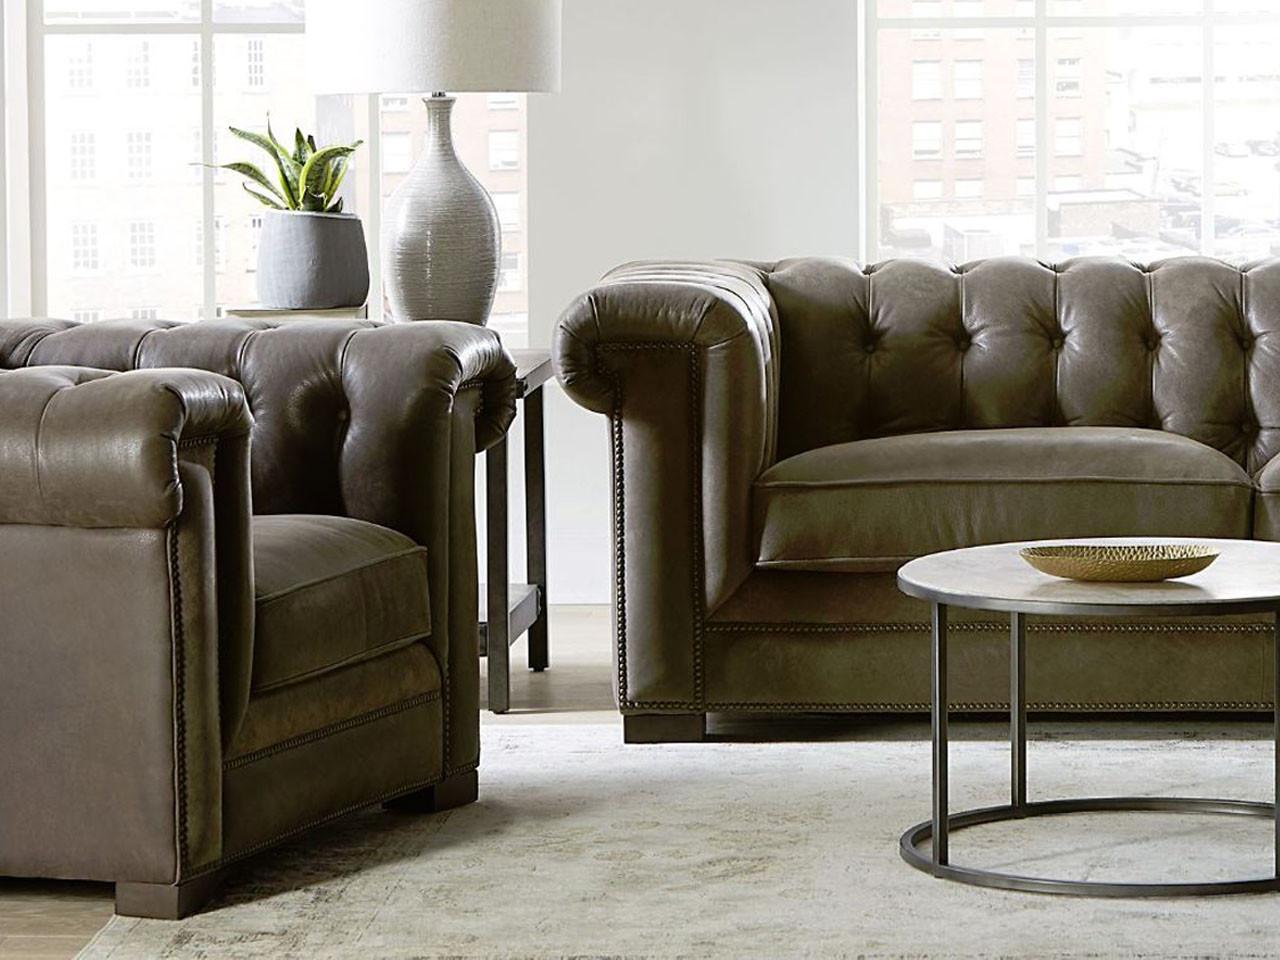 Gtr Tufted Back Leather Sofa